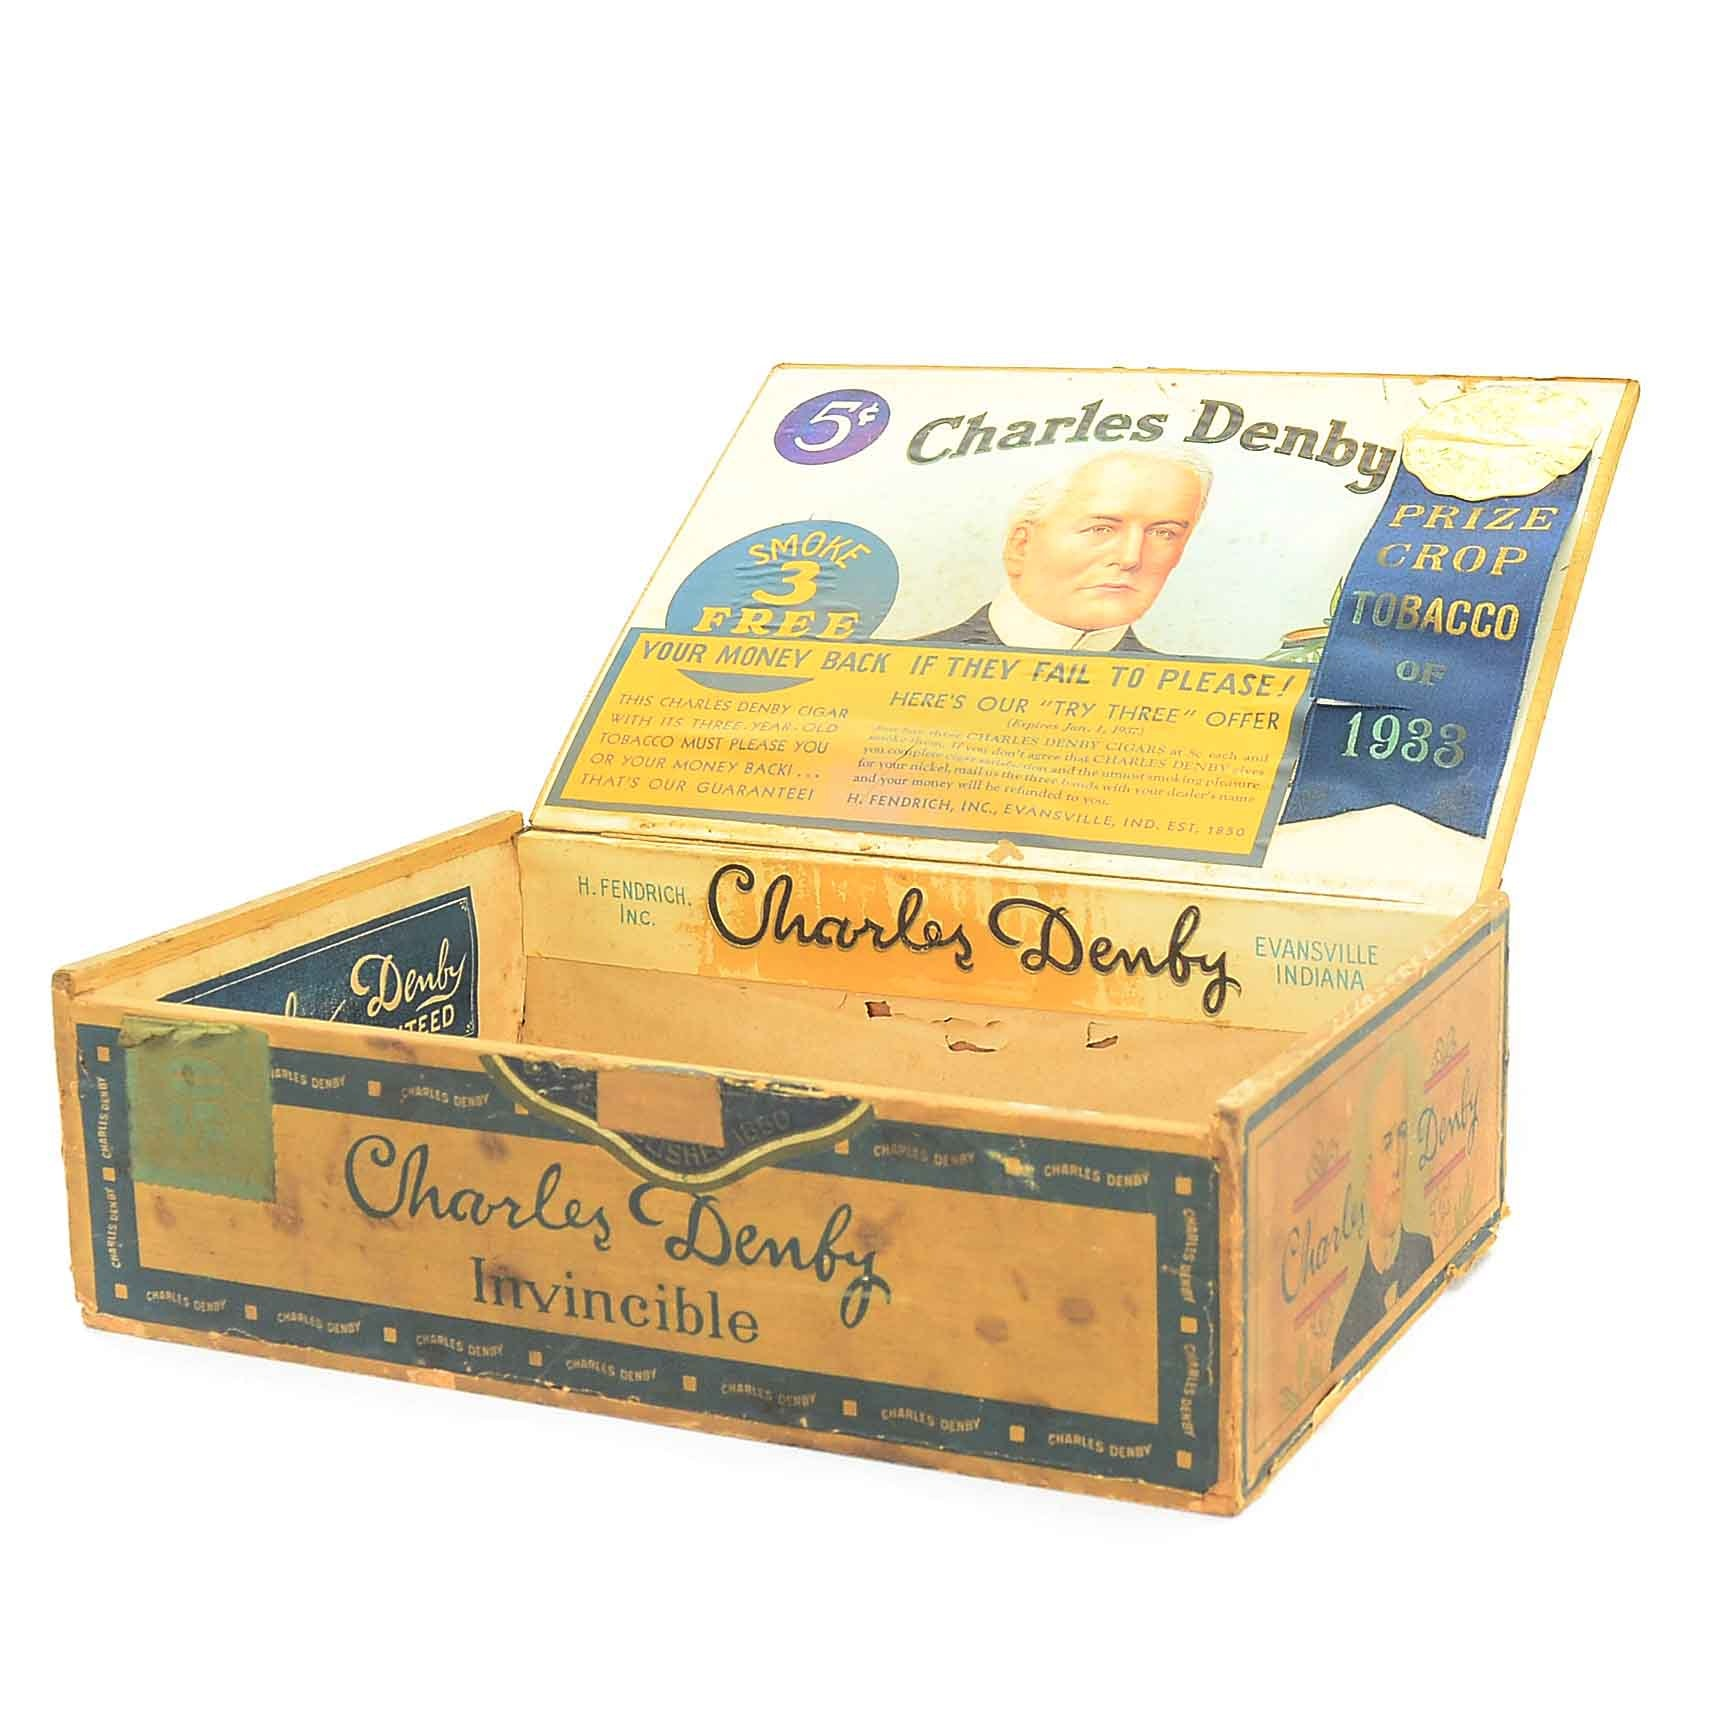 Vintage Charles Denby Cigar Box